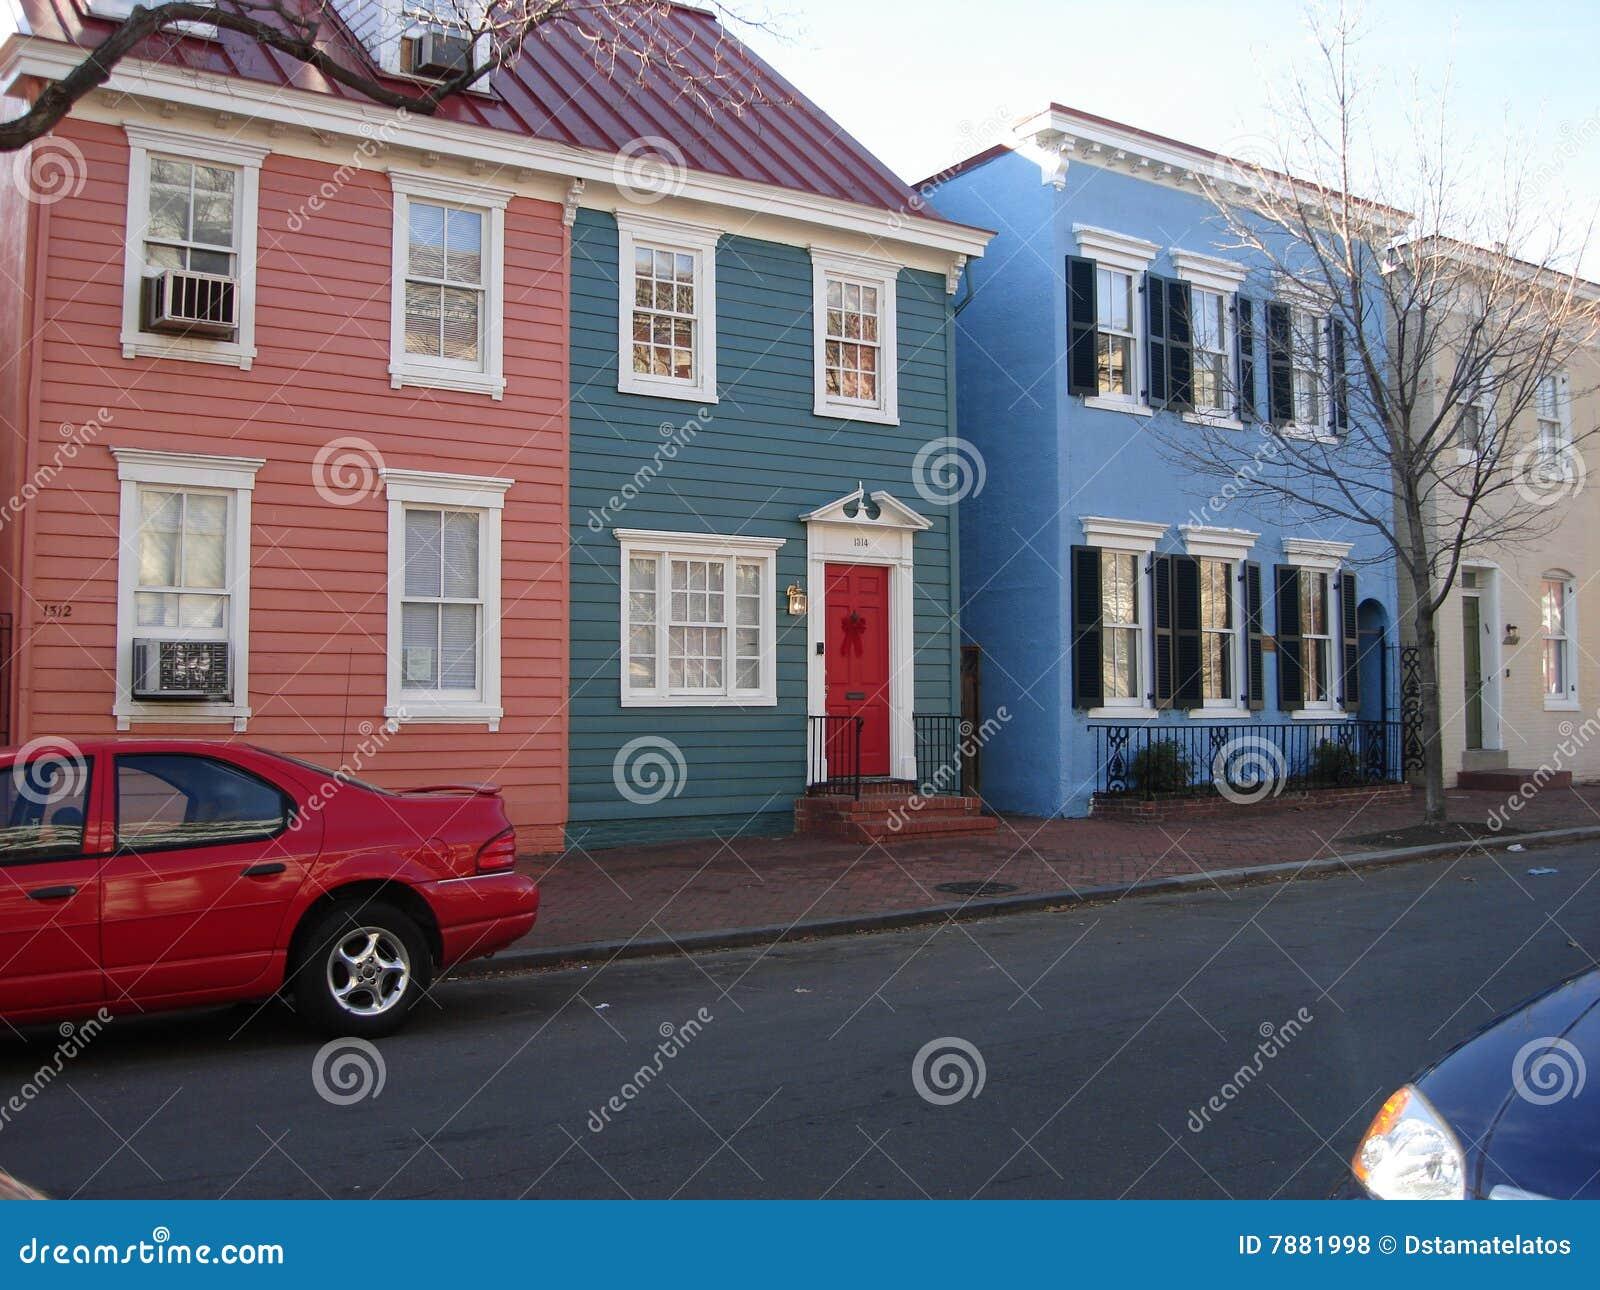 Georgetown rowhomes